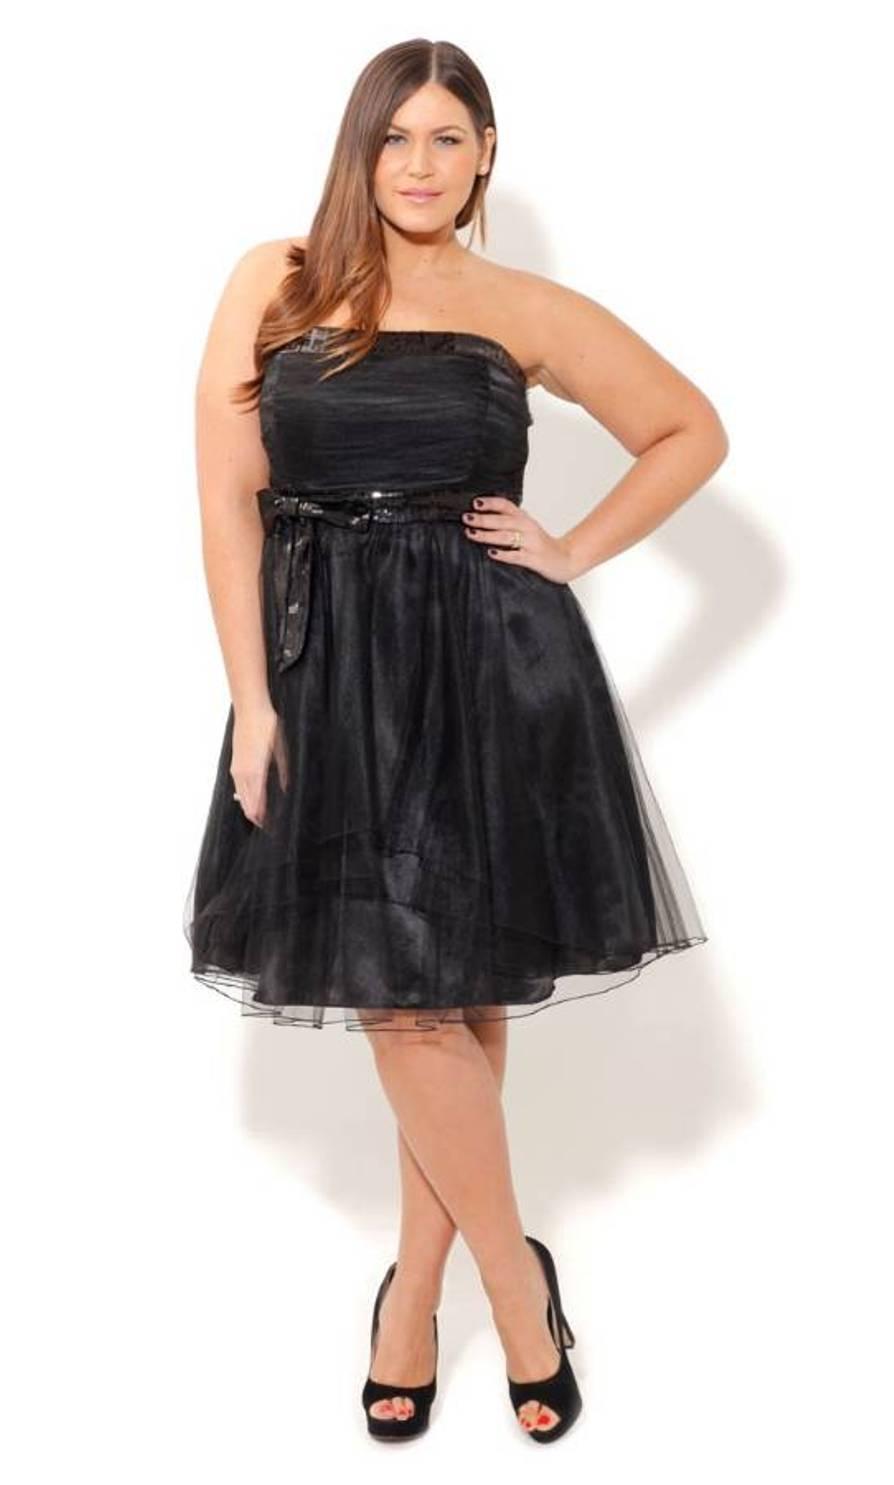 Plus Size Prom Dresses   DressedUpGirl.com